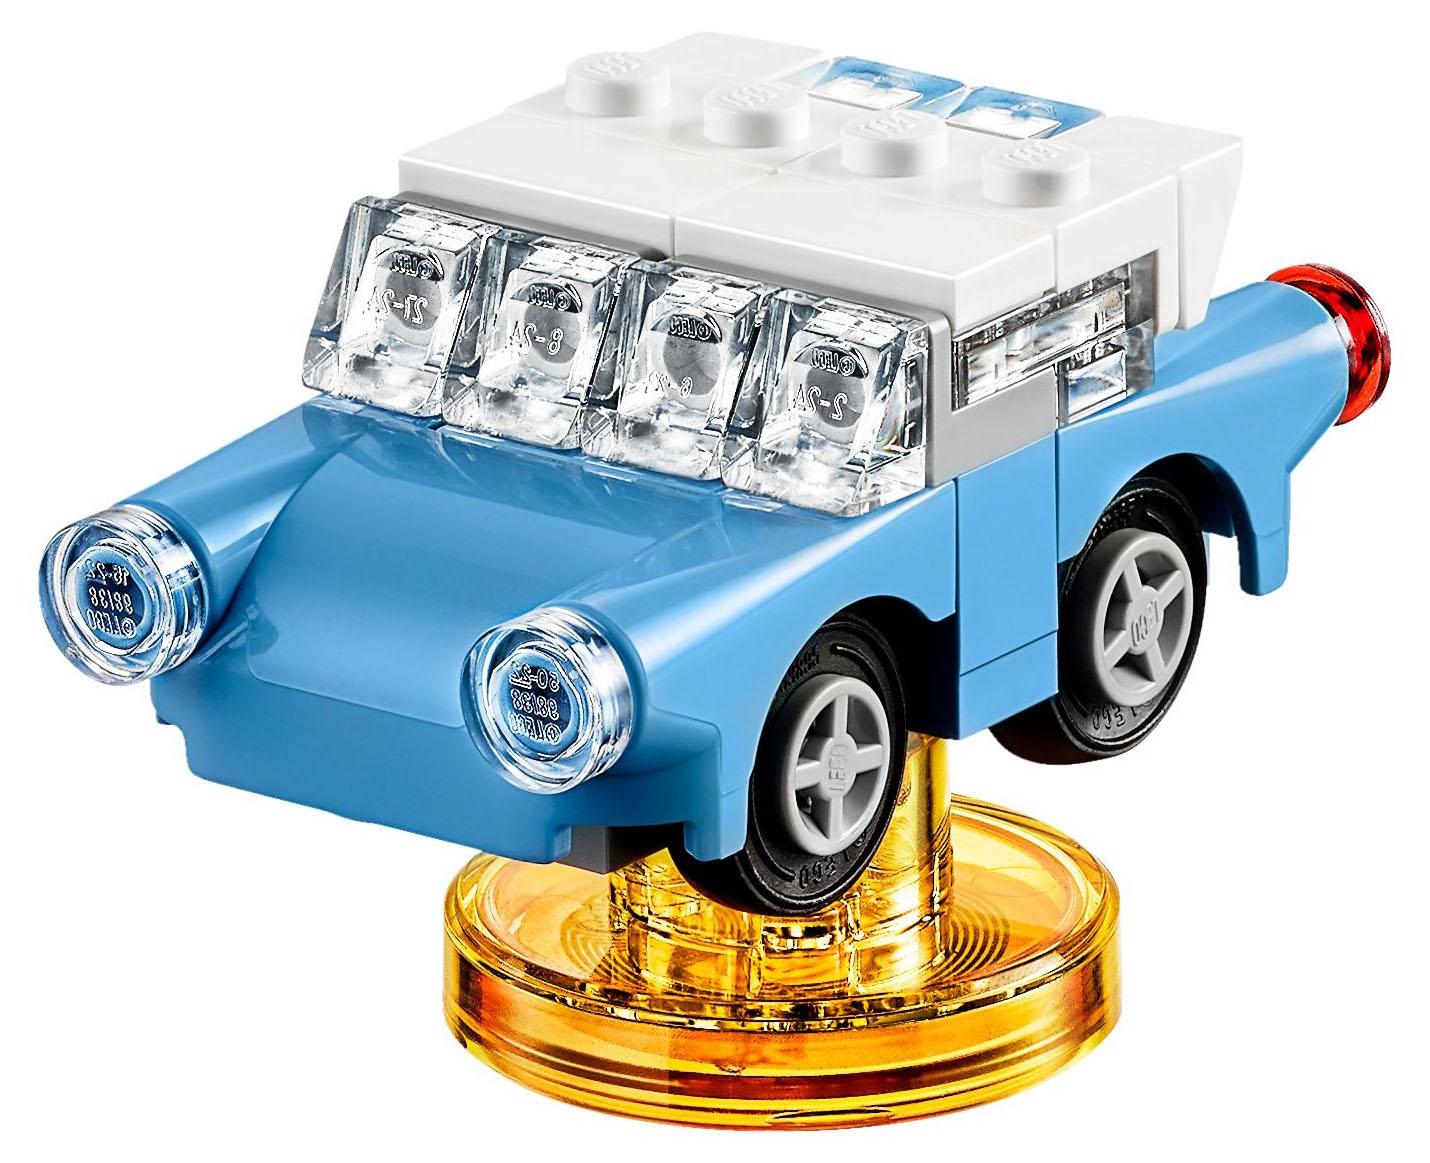 Enchanted Car Lego Dimensions Wiki Fandom Powered By Wikia